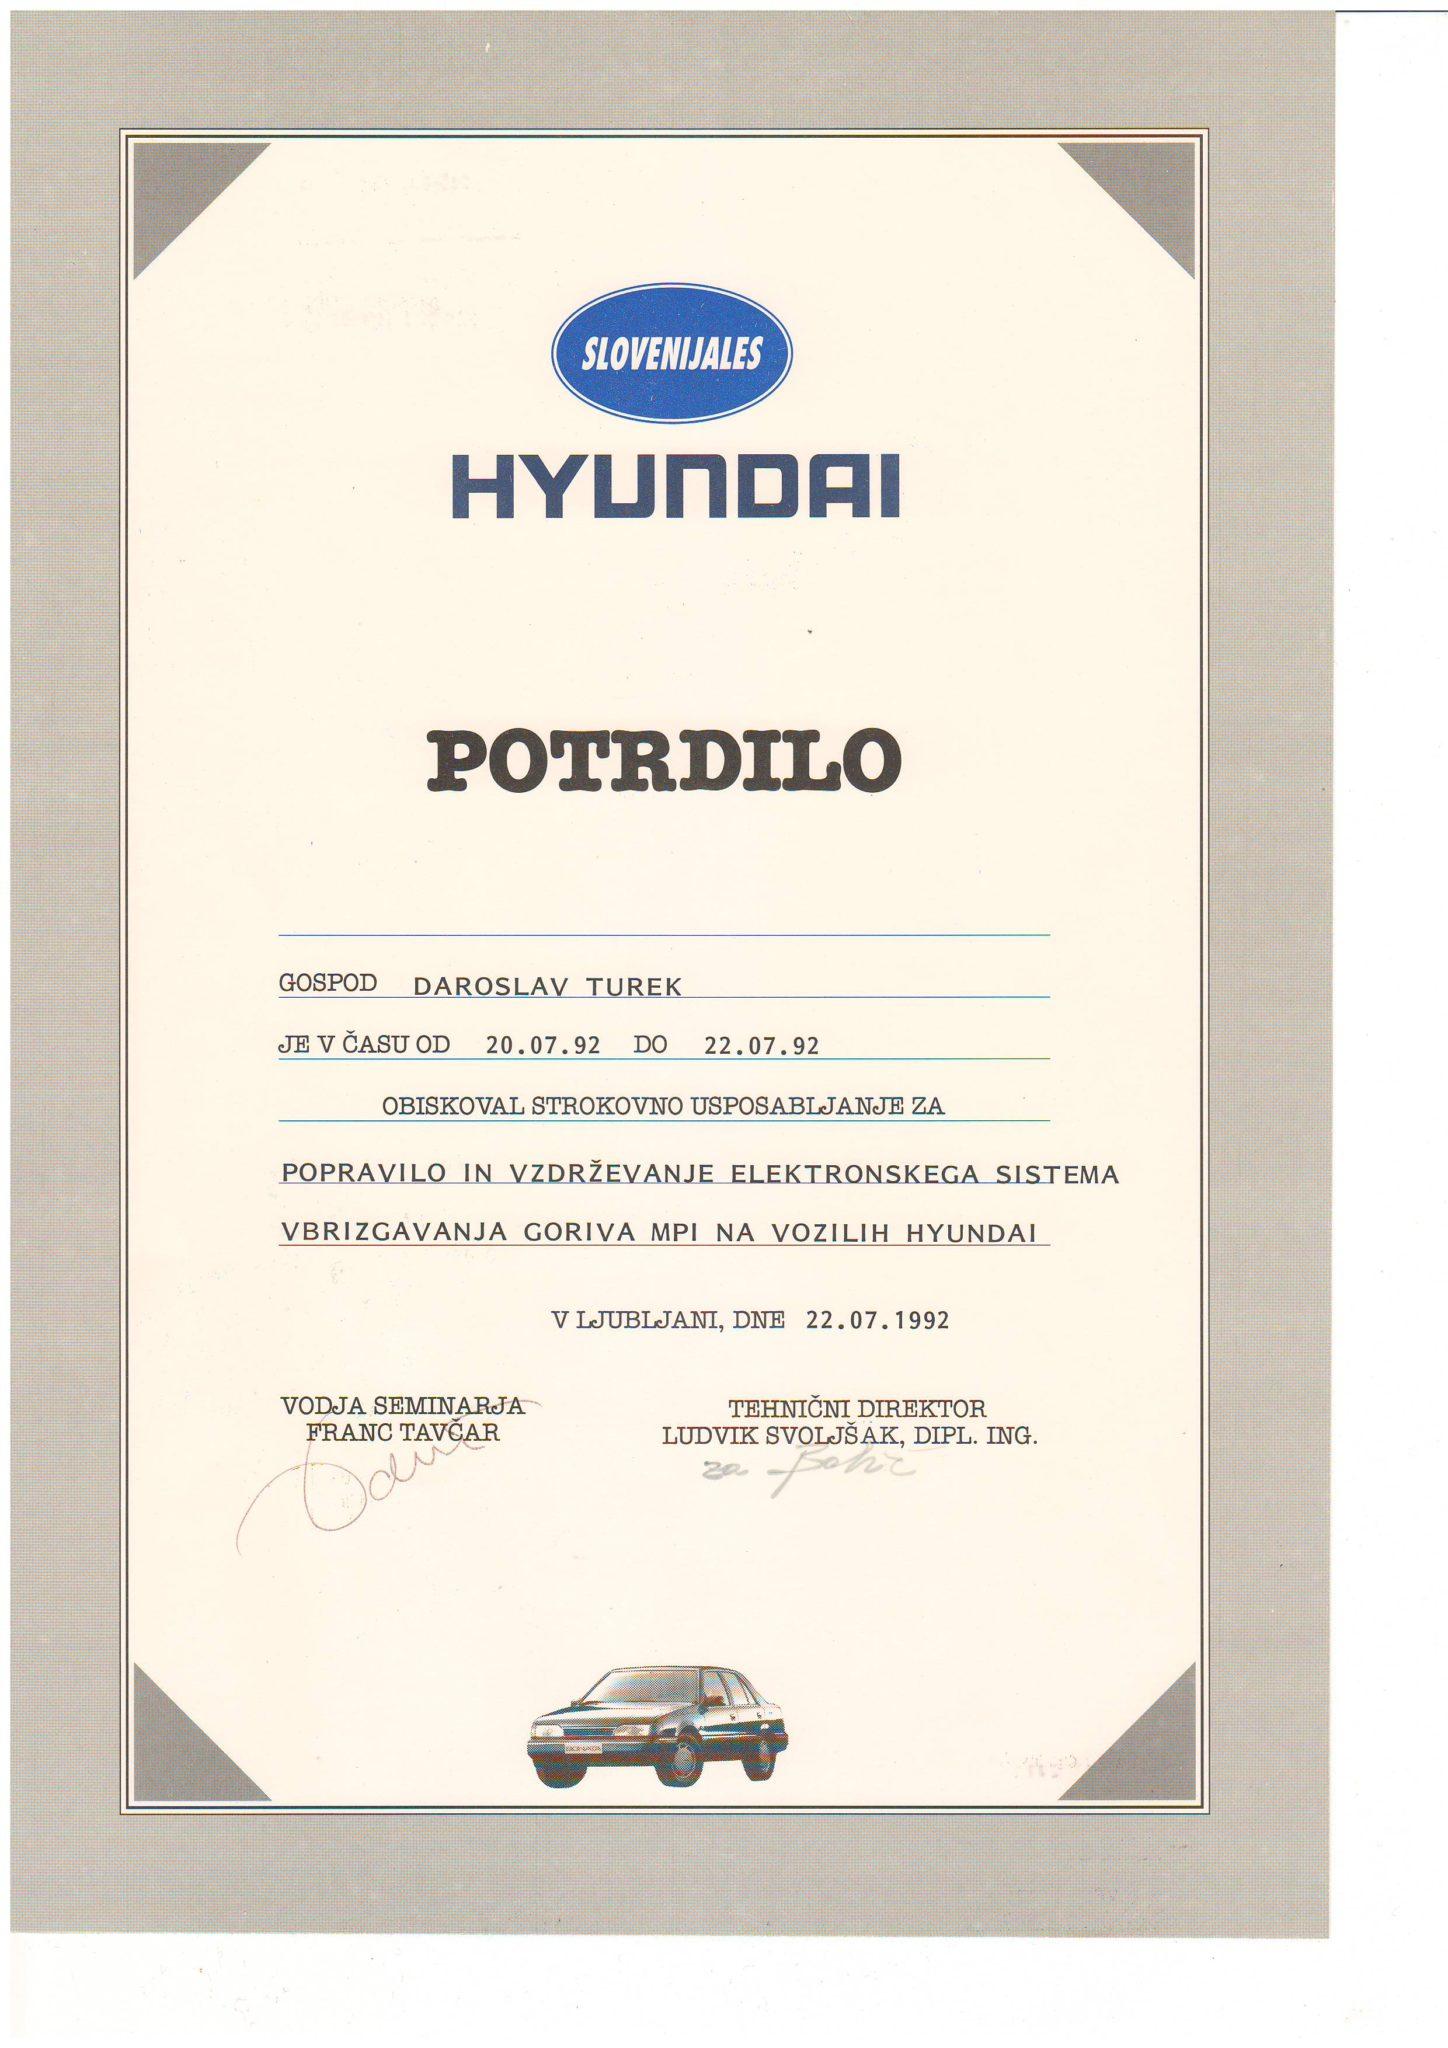 Picture of Hyundai - Elektronski sistem ubrizgavanja